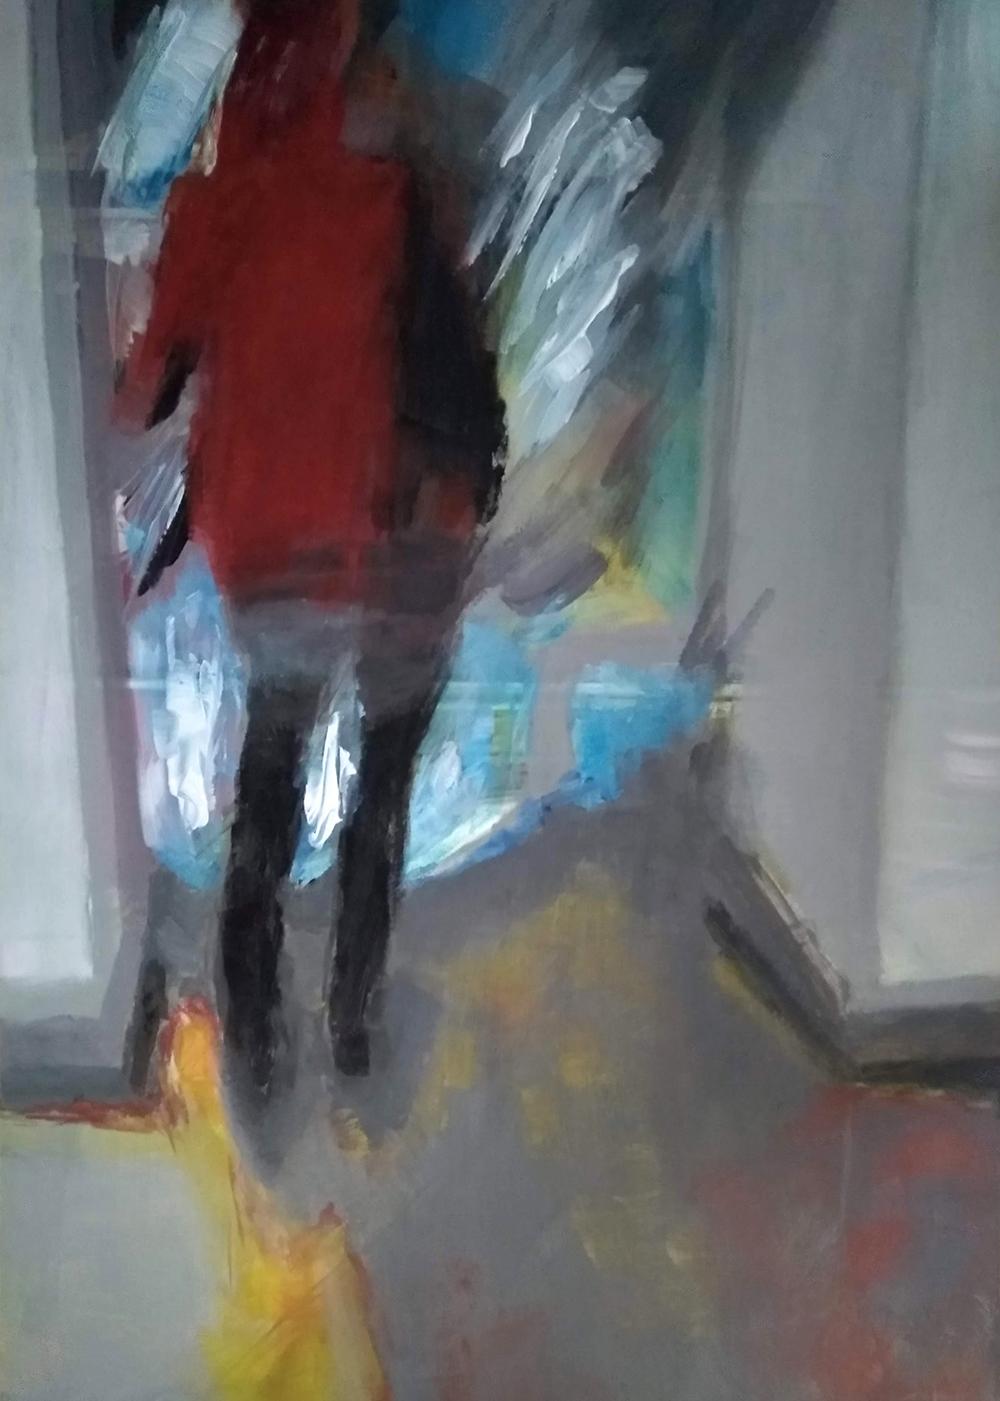 Lief_Simons_Lief Simons - The door